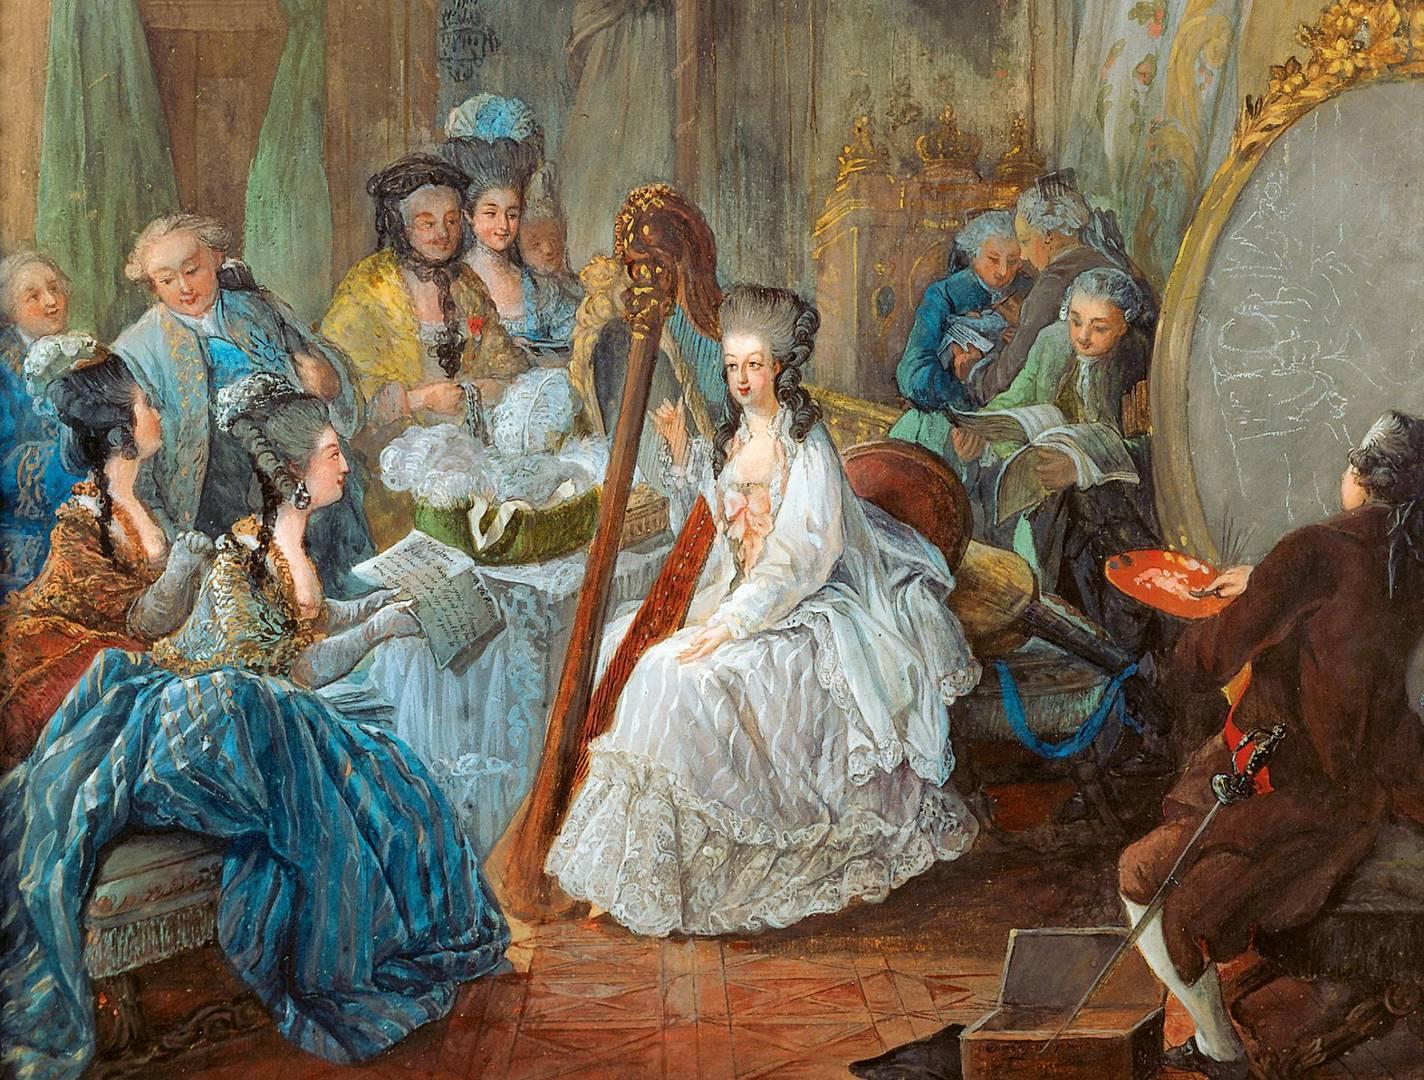 Жан-Батист-Андре Готье-Даготи. Мария-Антуанета дает  концерт  на арфе. 1775